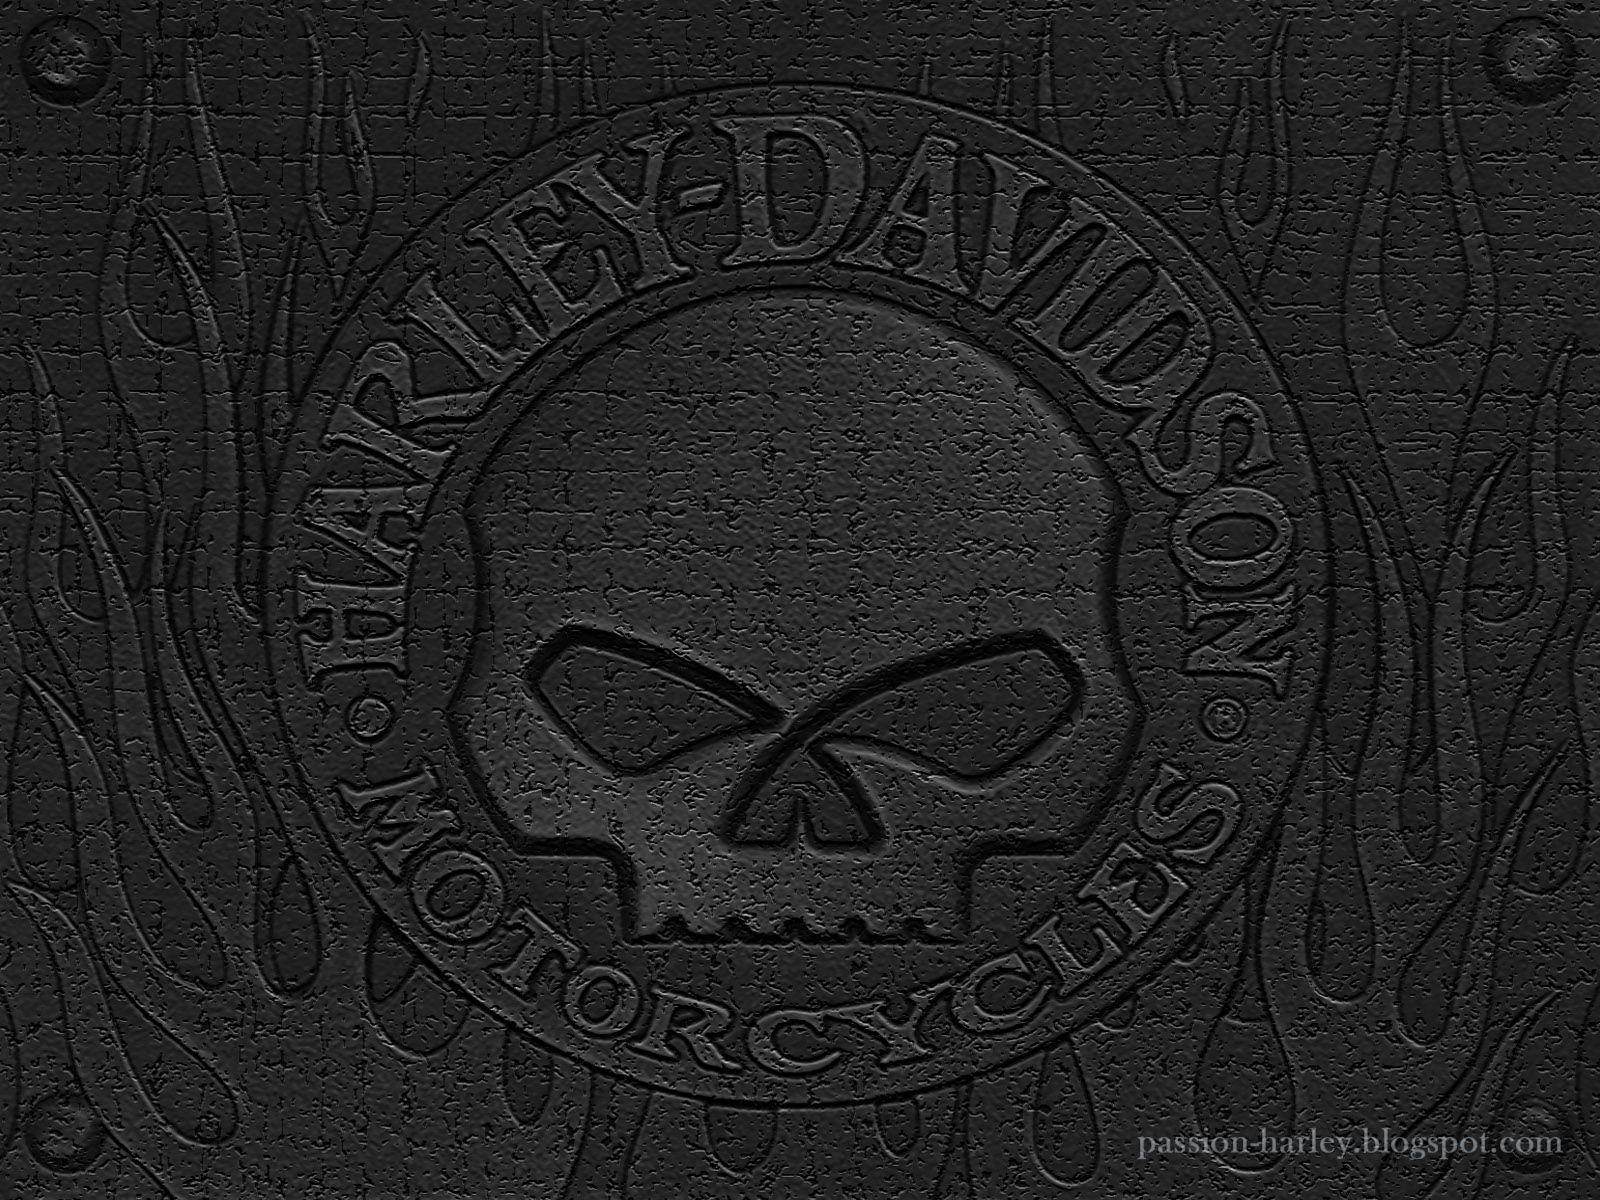 Harley Davidson Skull Wallpapers Top Free Harley Davidson Skull Backgrounds Wallpaperaccess